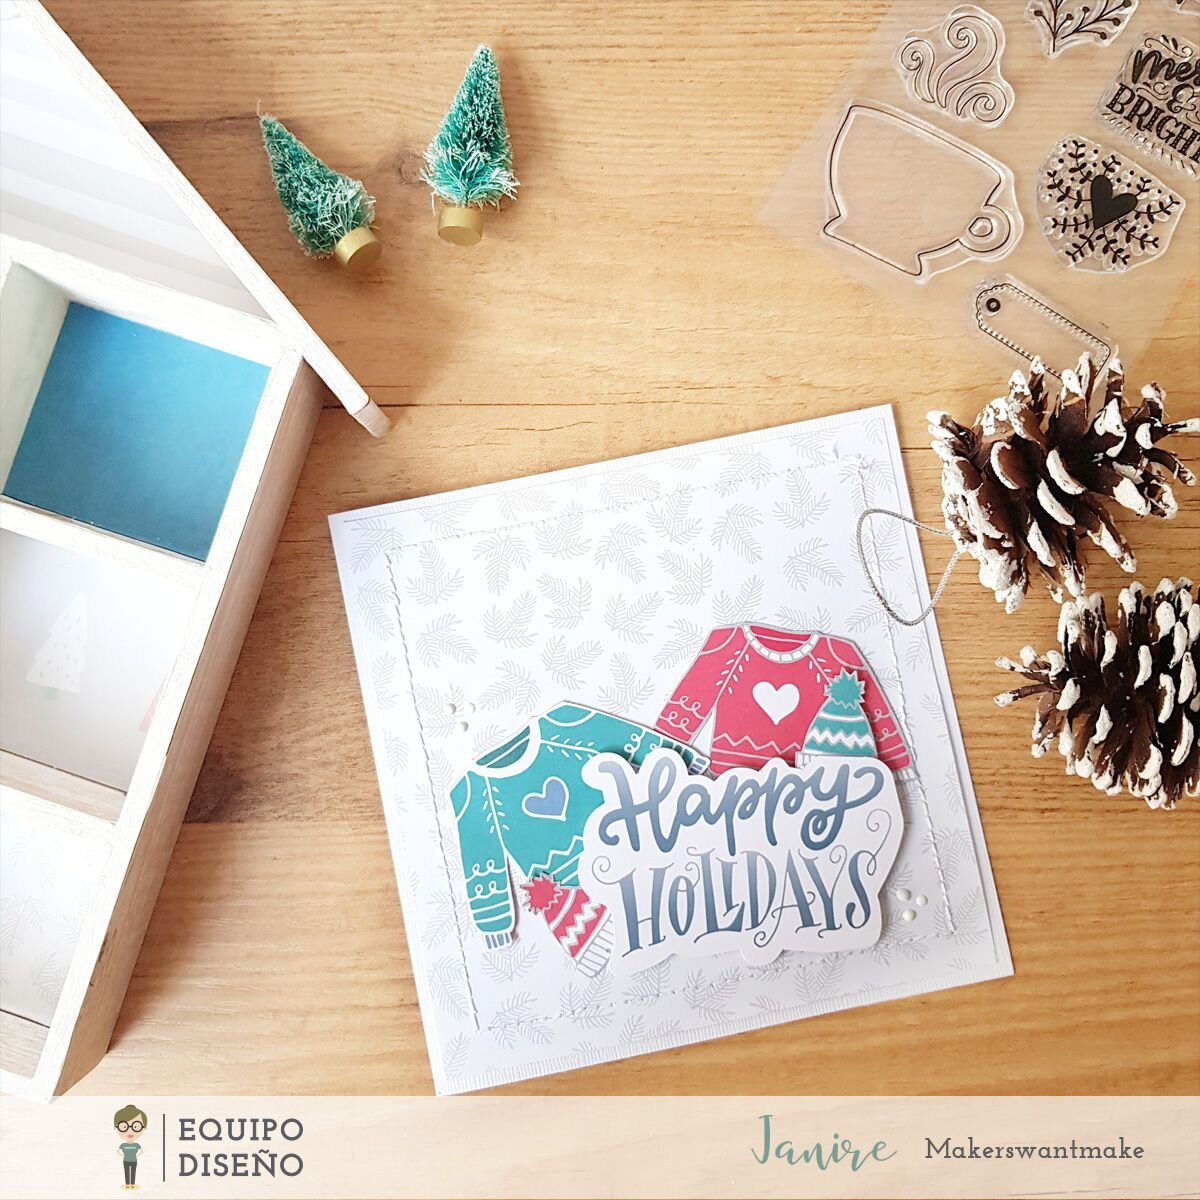 cocoloko-tutorial-tarjetas-navidad-lagom-04.jpg